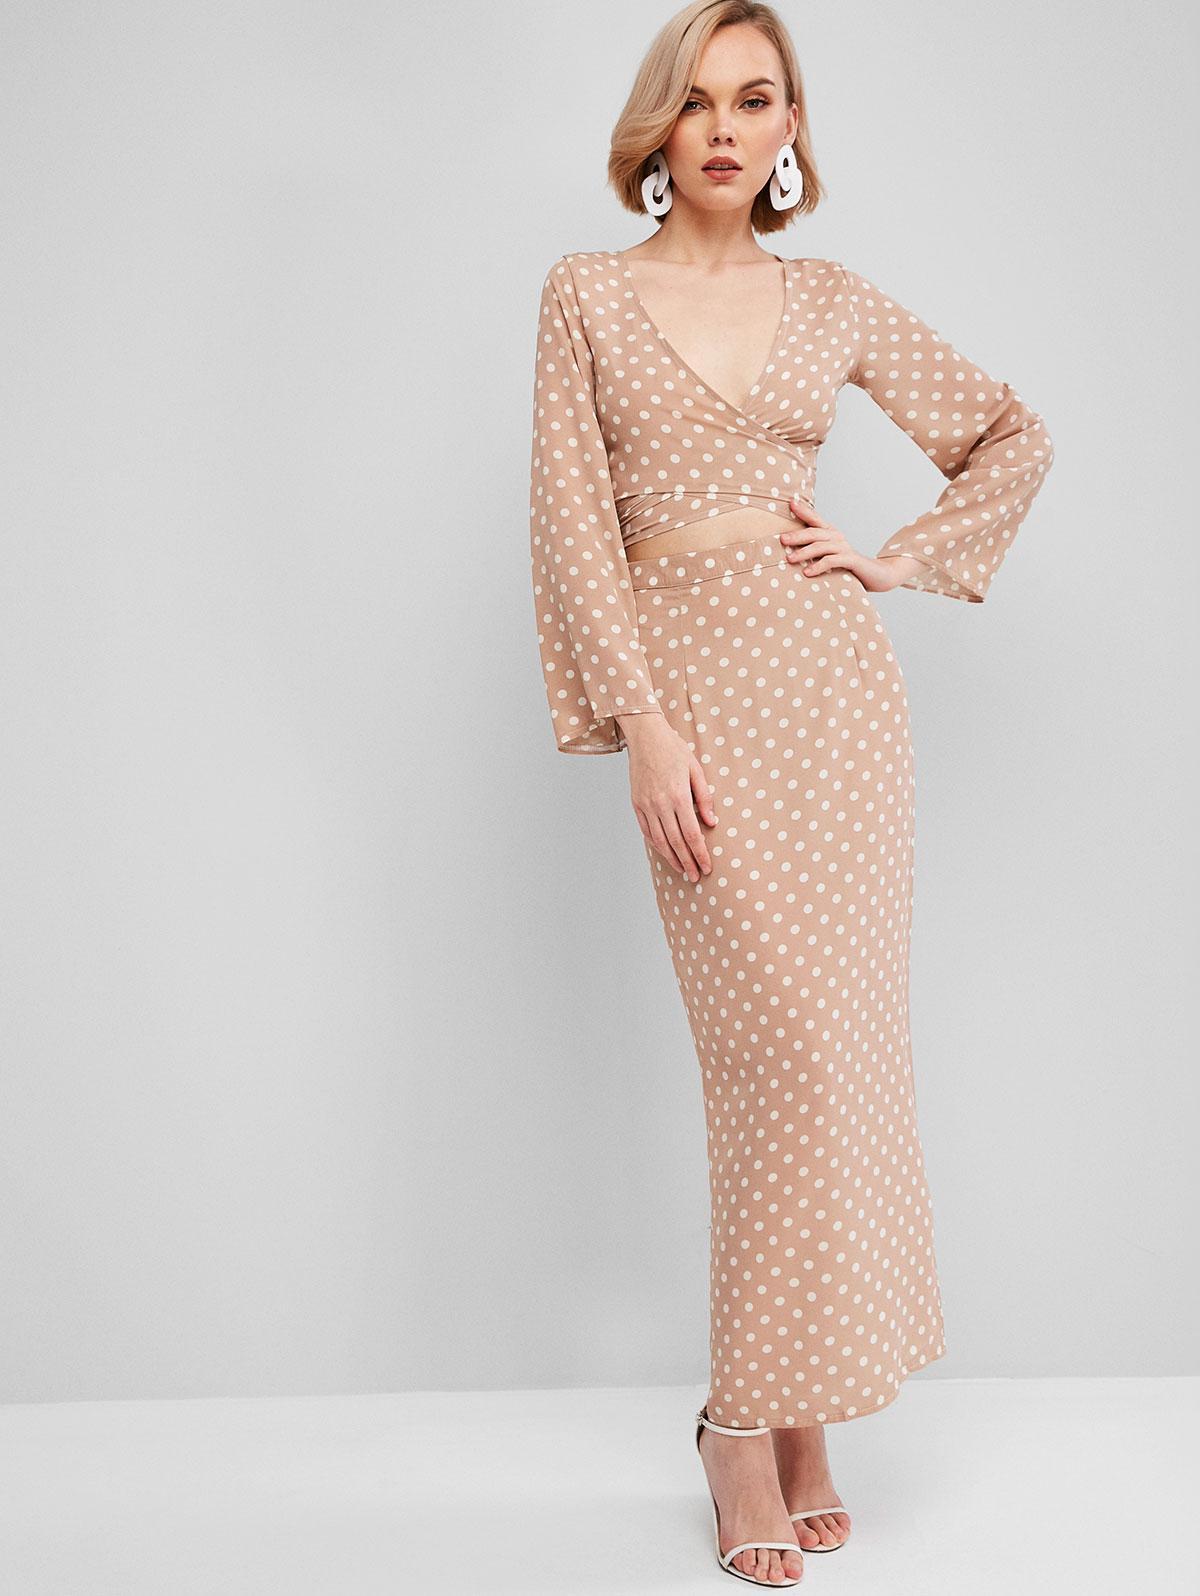 Wrap Polka Dot Slit Two Piece Dress